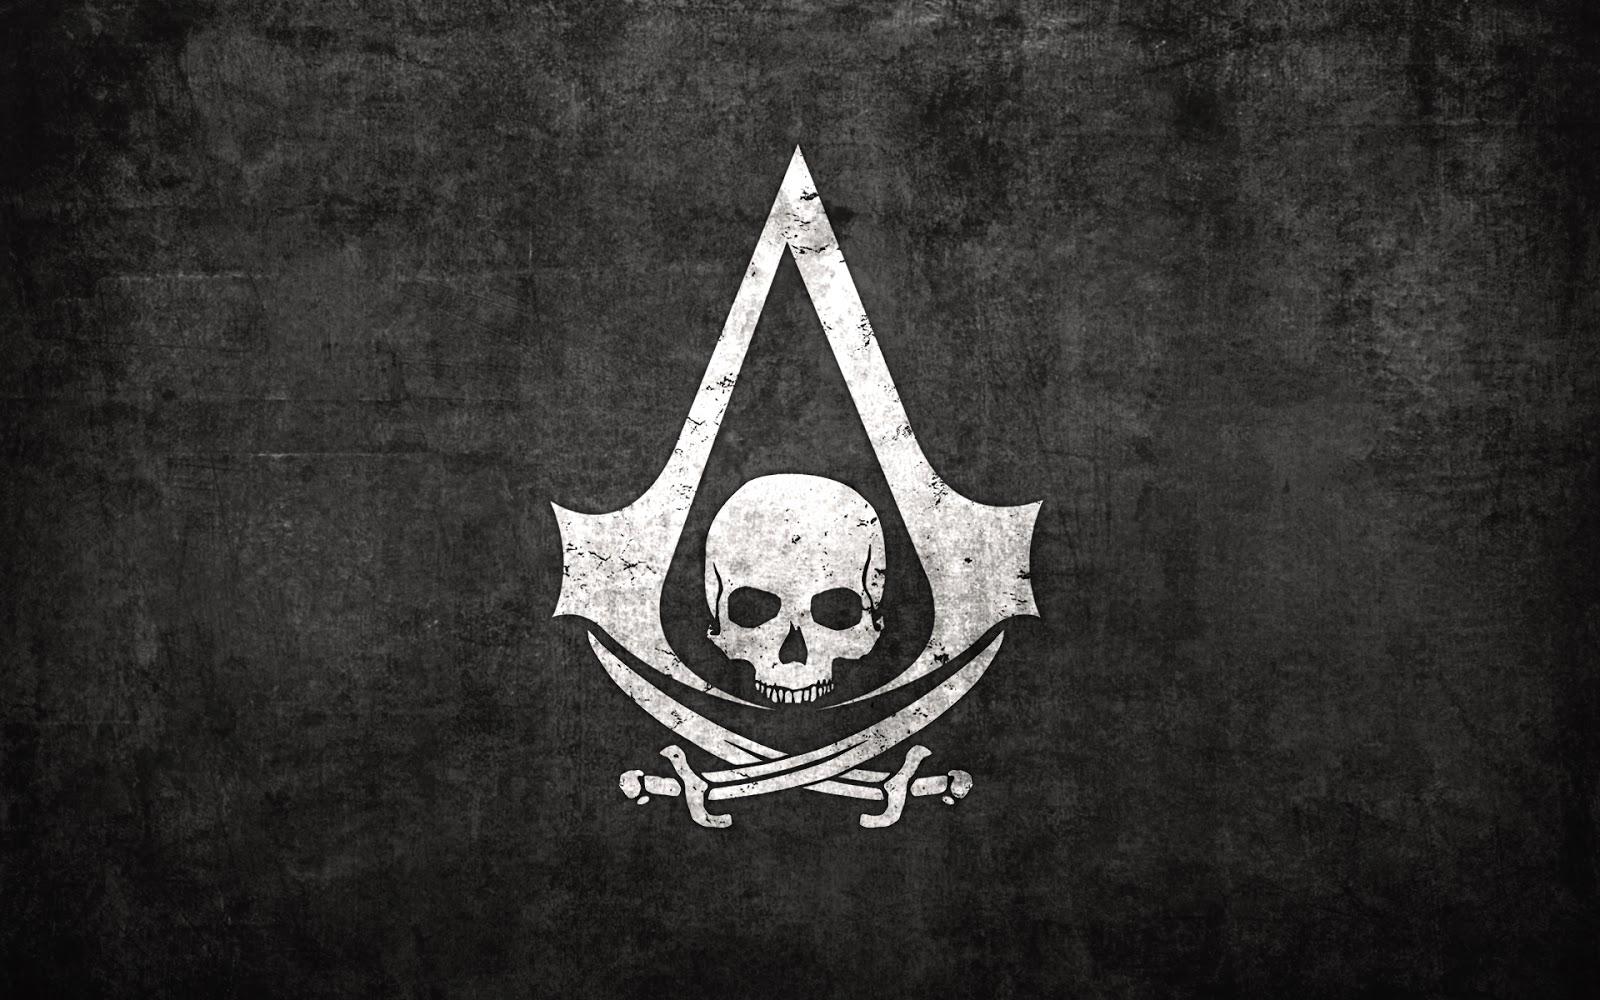 Free Download Assassins Creed Logo Skull Sword Video Game Hd